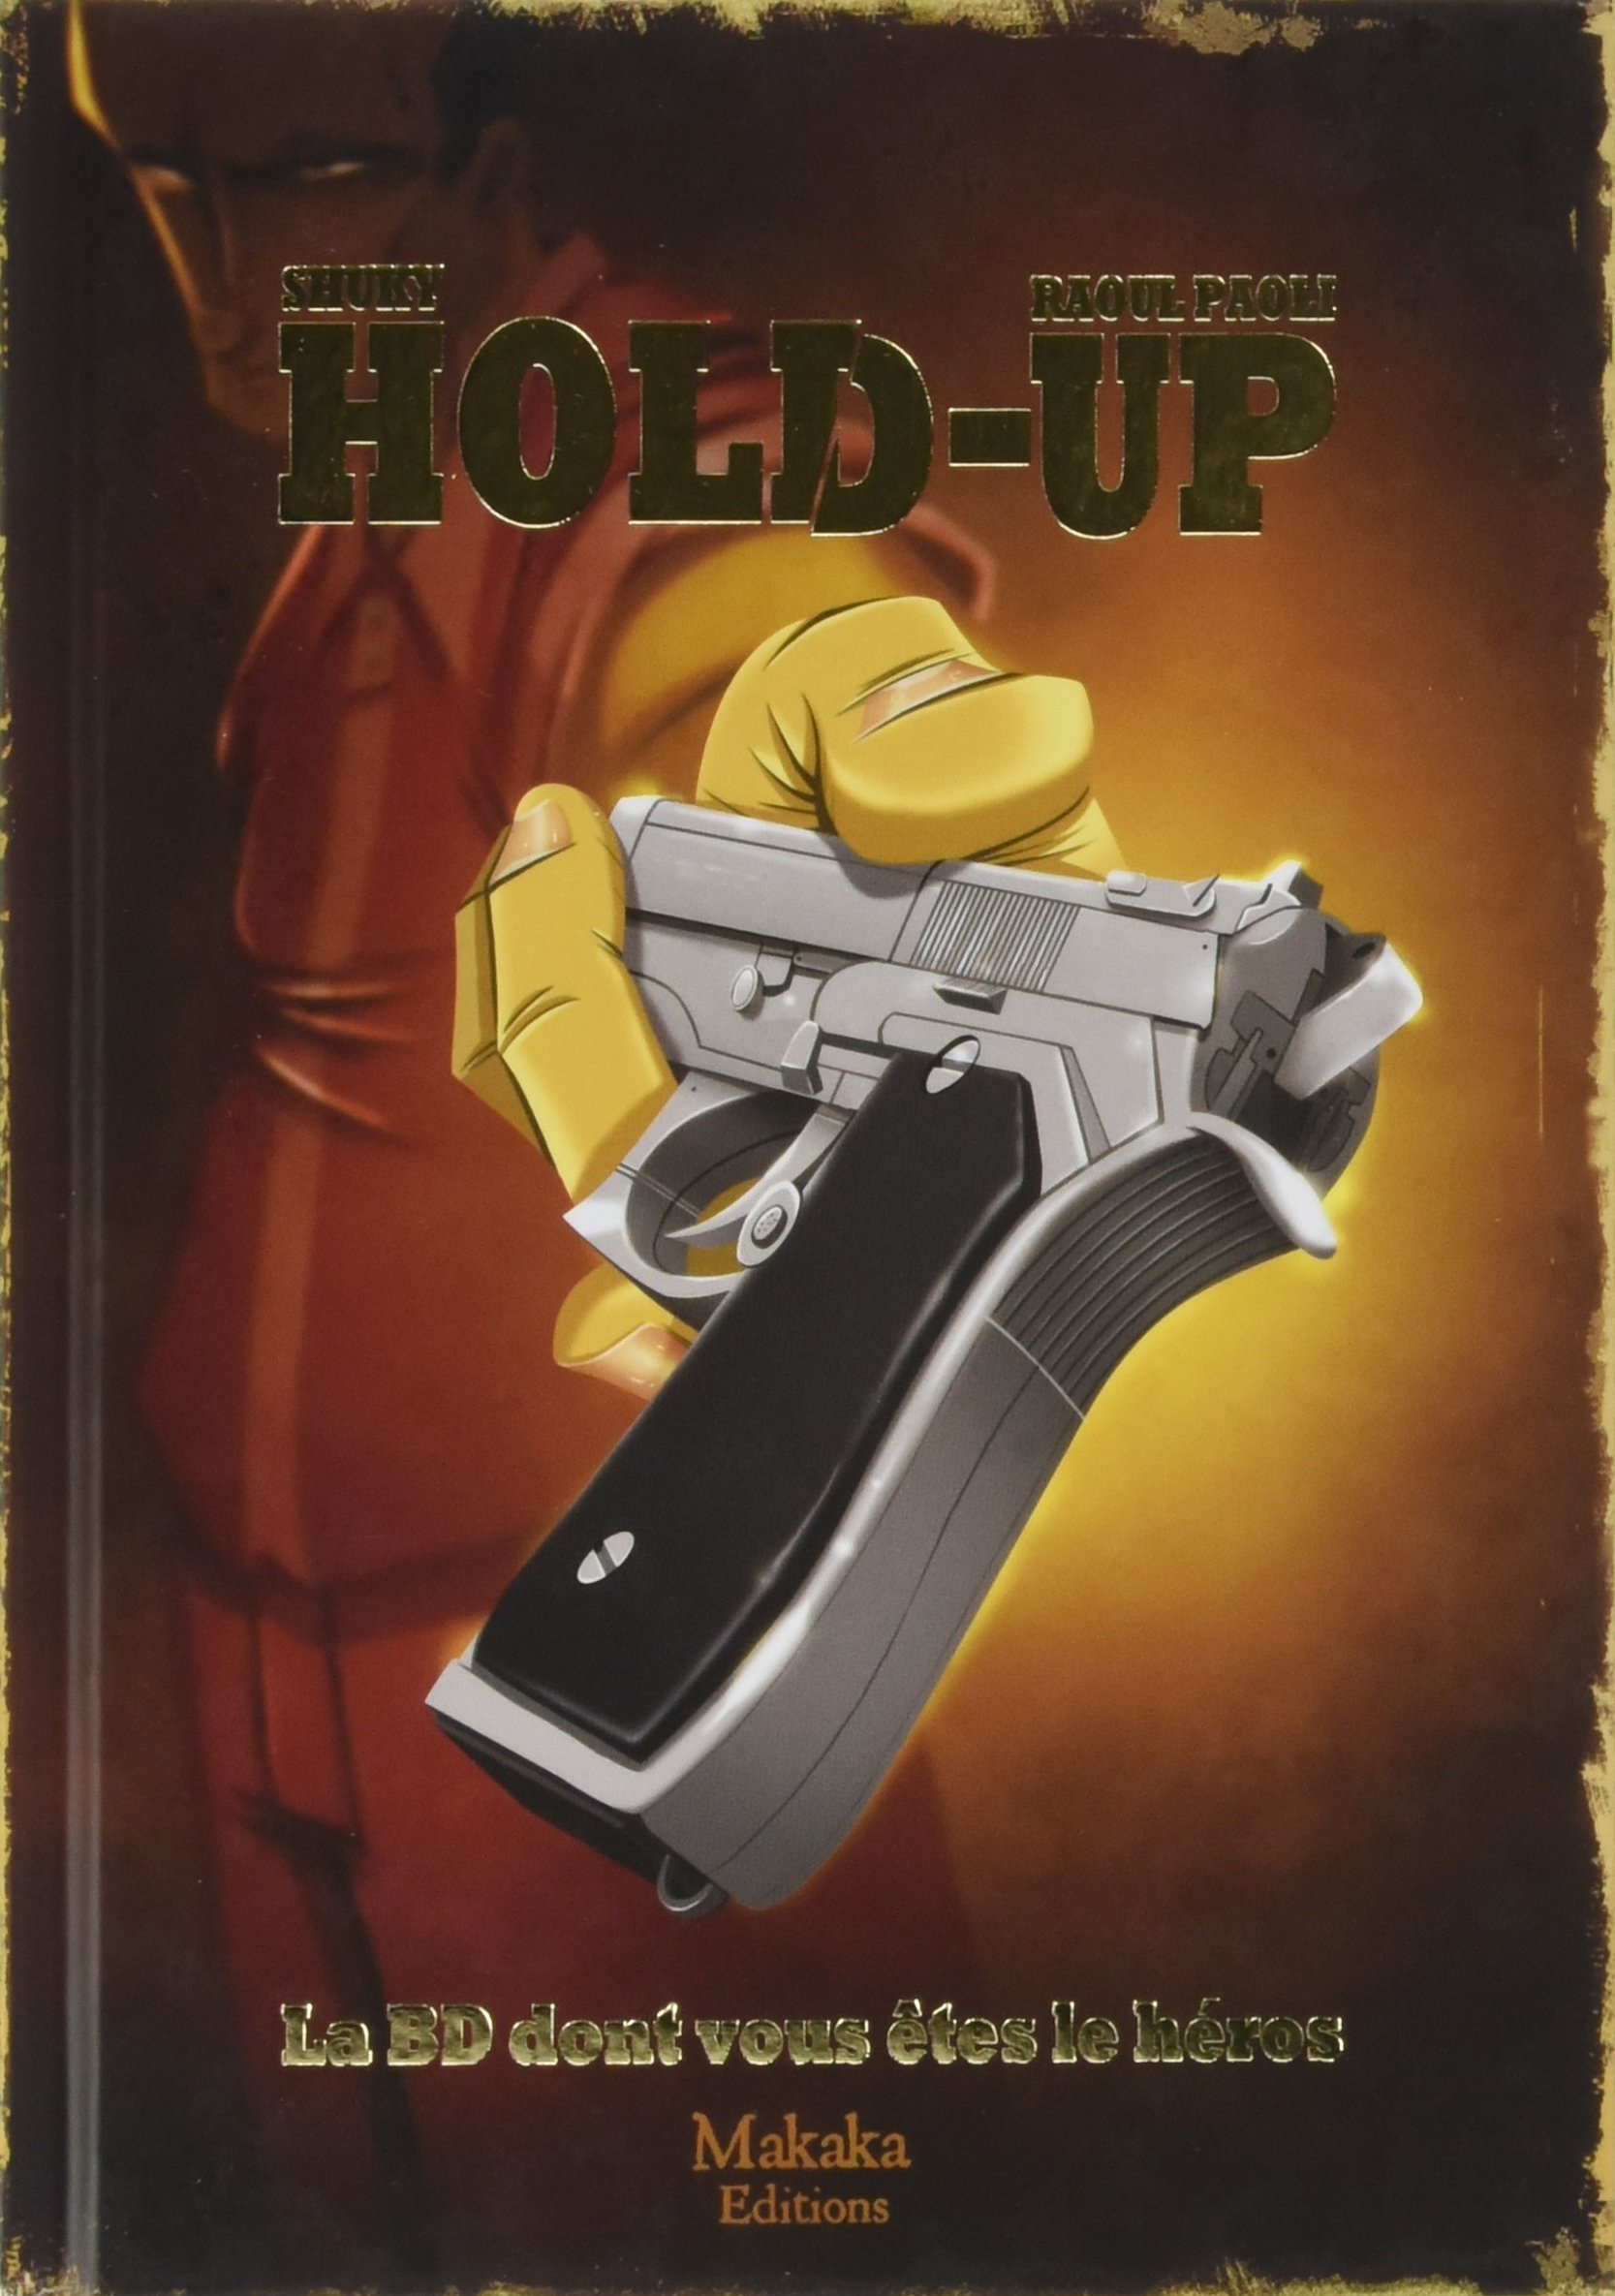 Hold-up Album – 19 mai 2017 Raoul Paoli Shuky Makaka Editions 2917371757